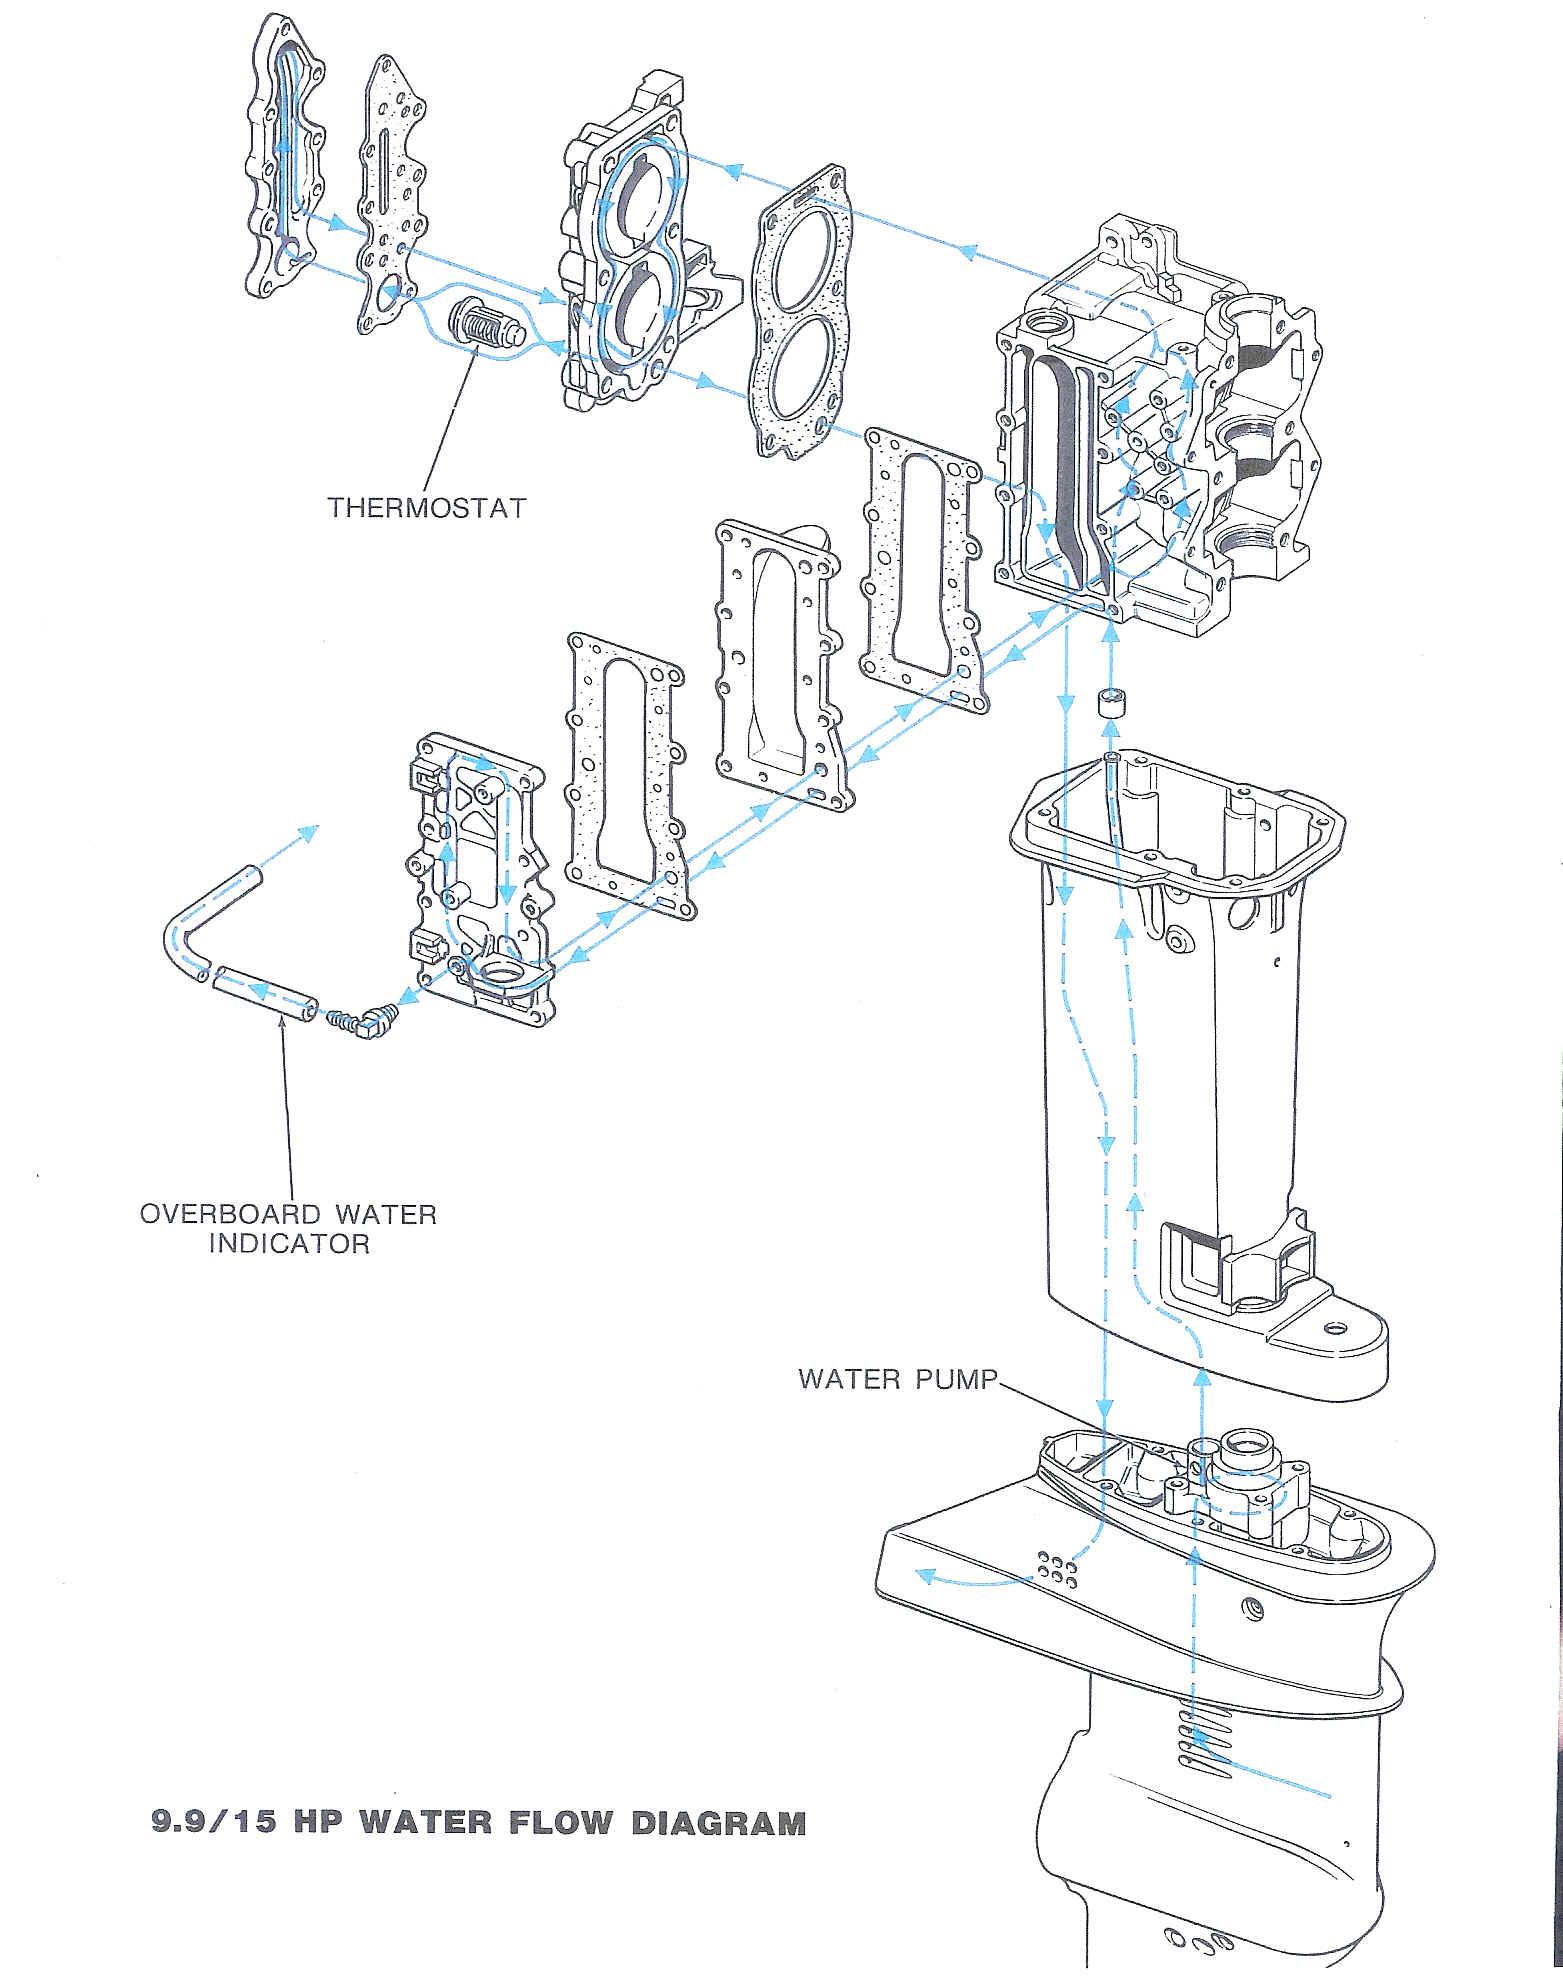 Johnson 15 Fuel Pump Diagram - Wiring Diagrams Hubs - Mercury Outboard Wiring Harness Diagram